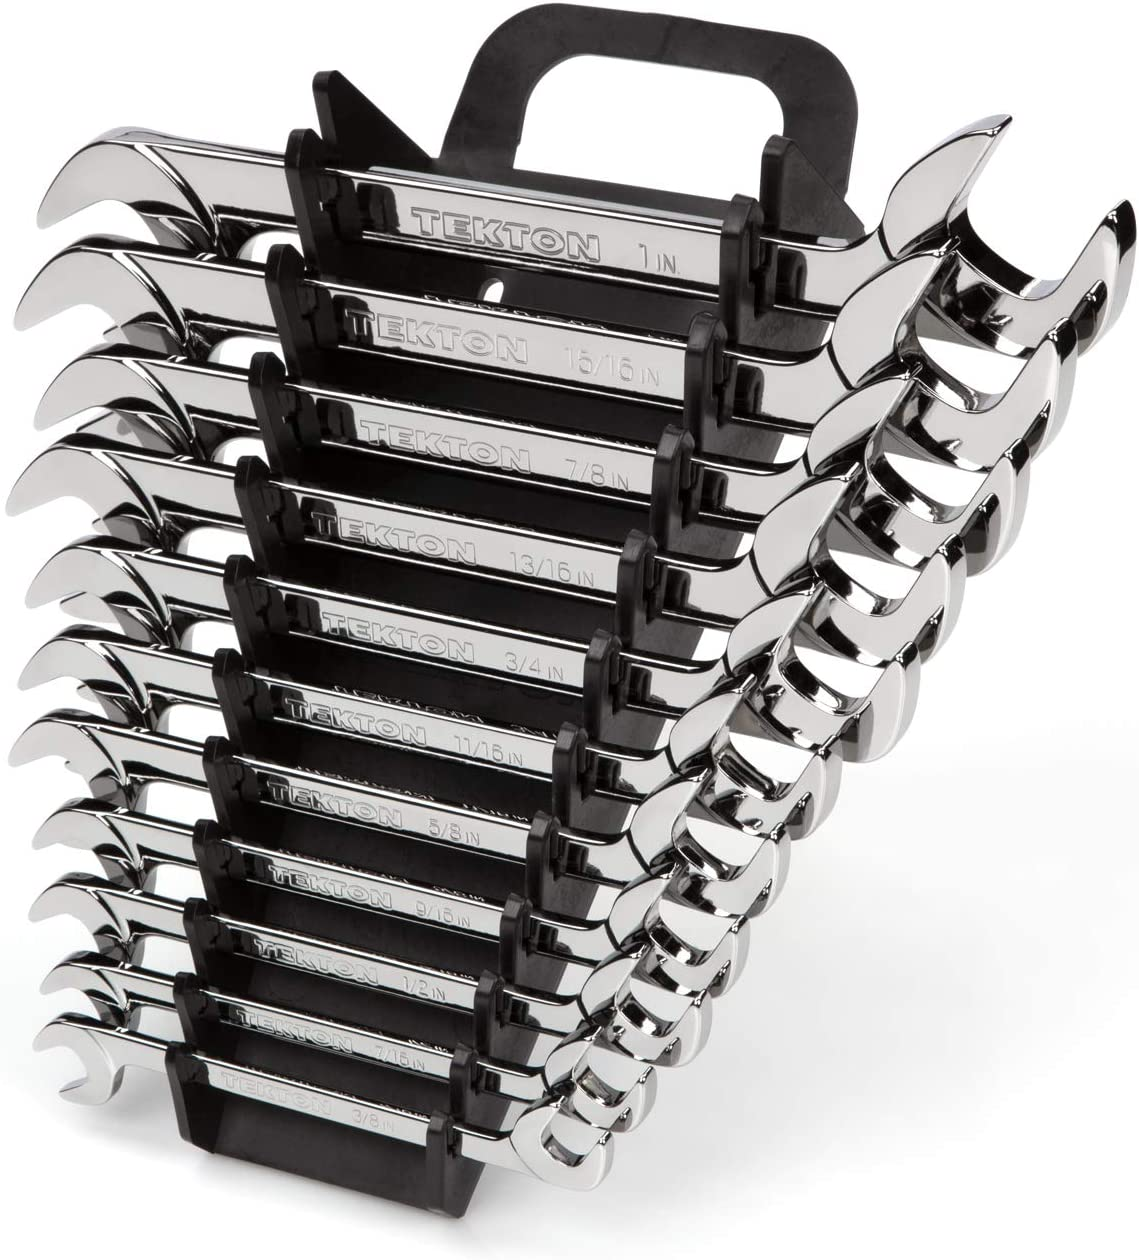 - Holder TEKTON Angle Head Open End Wrench Set 12-Piece WAE91201 8-19 mm